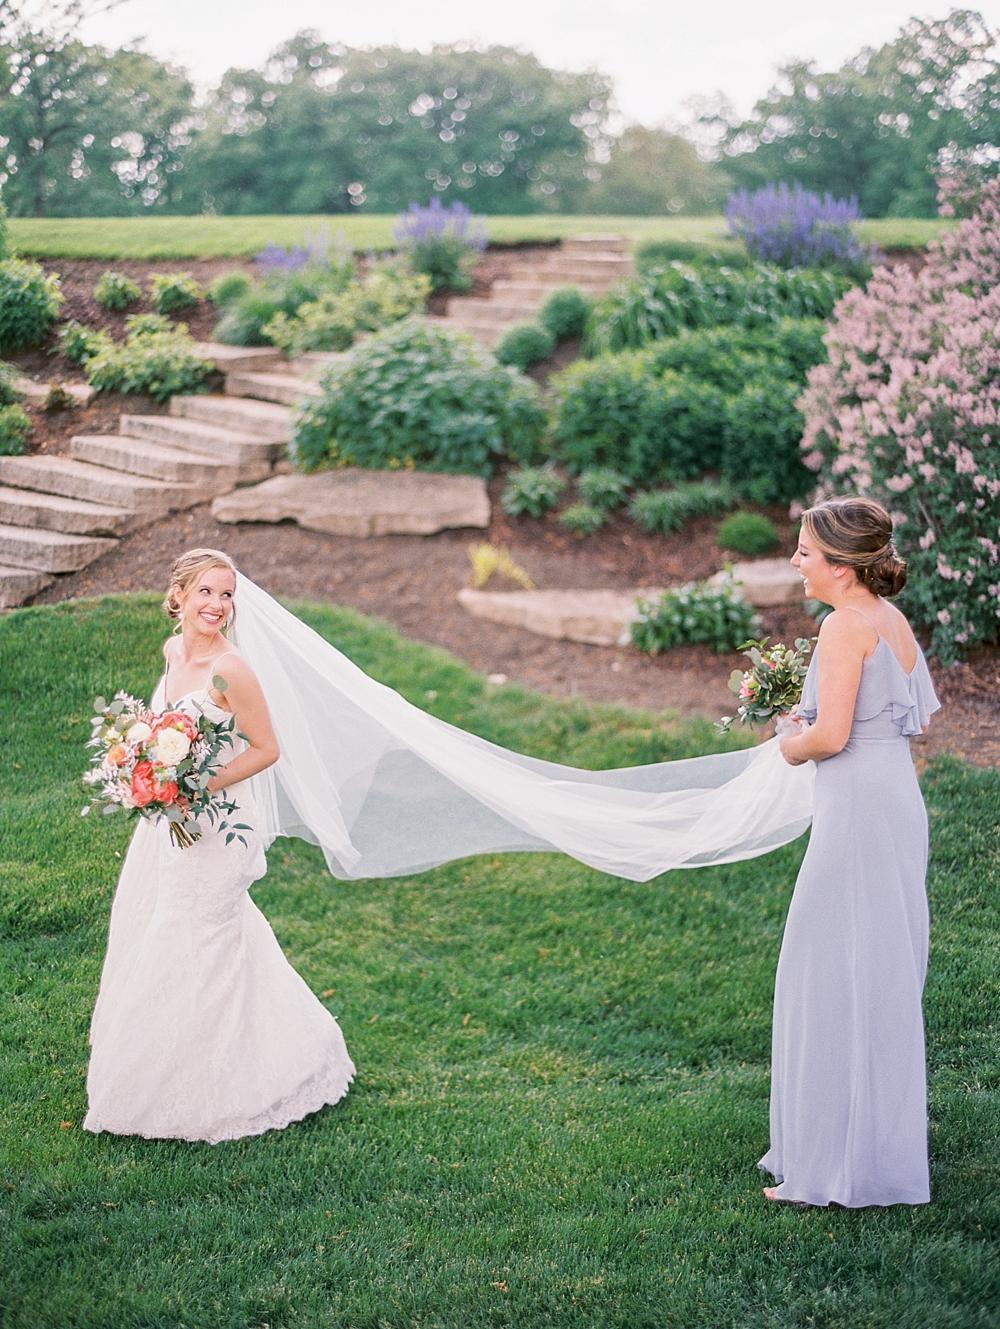 kristin-la-voie-photography-butterfield-country-club-best-chicago-austin-wedding-fine-art-photographer-7